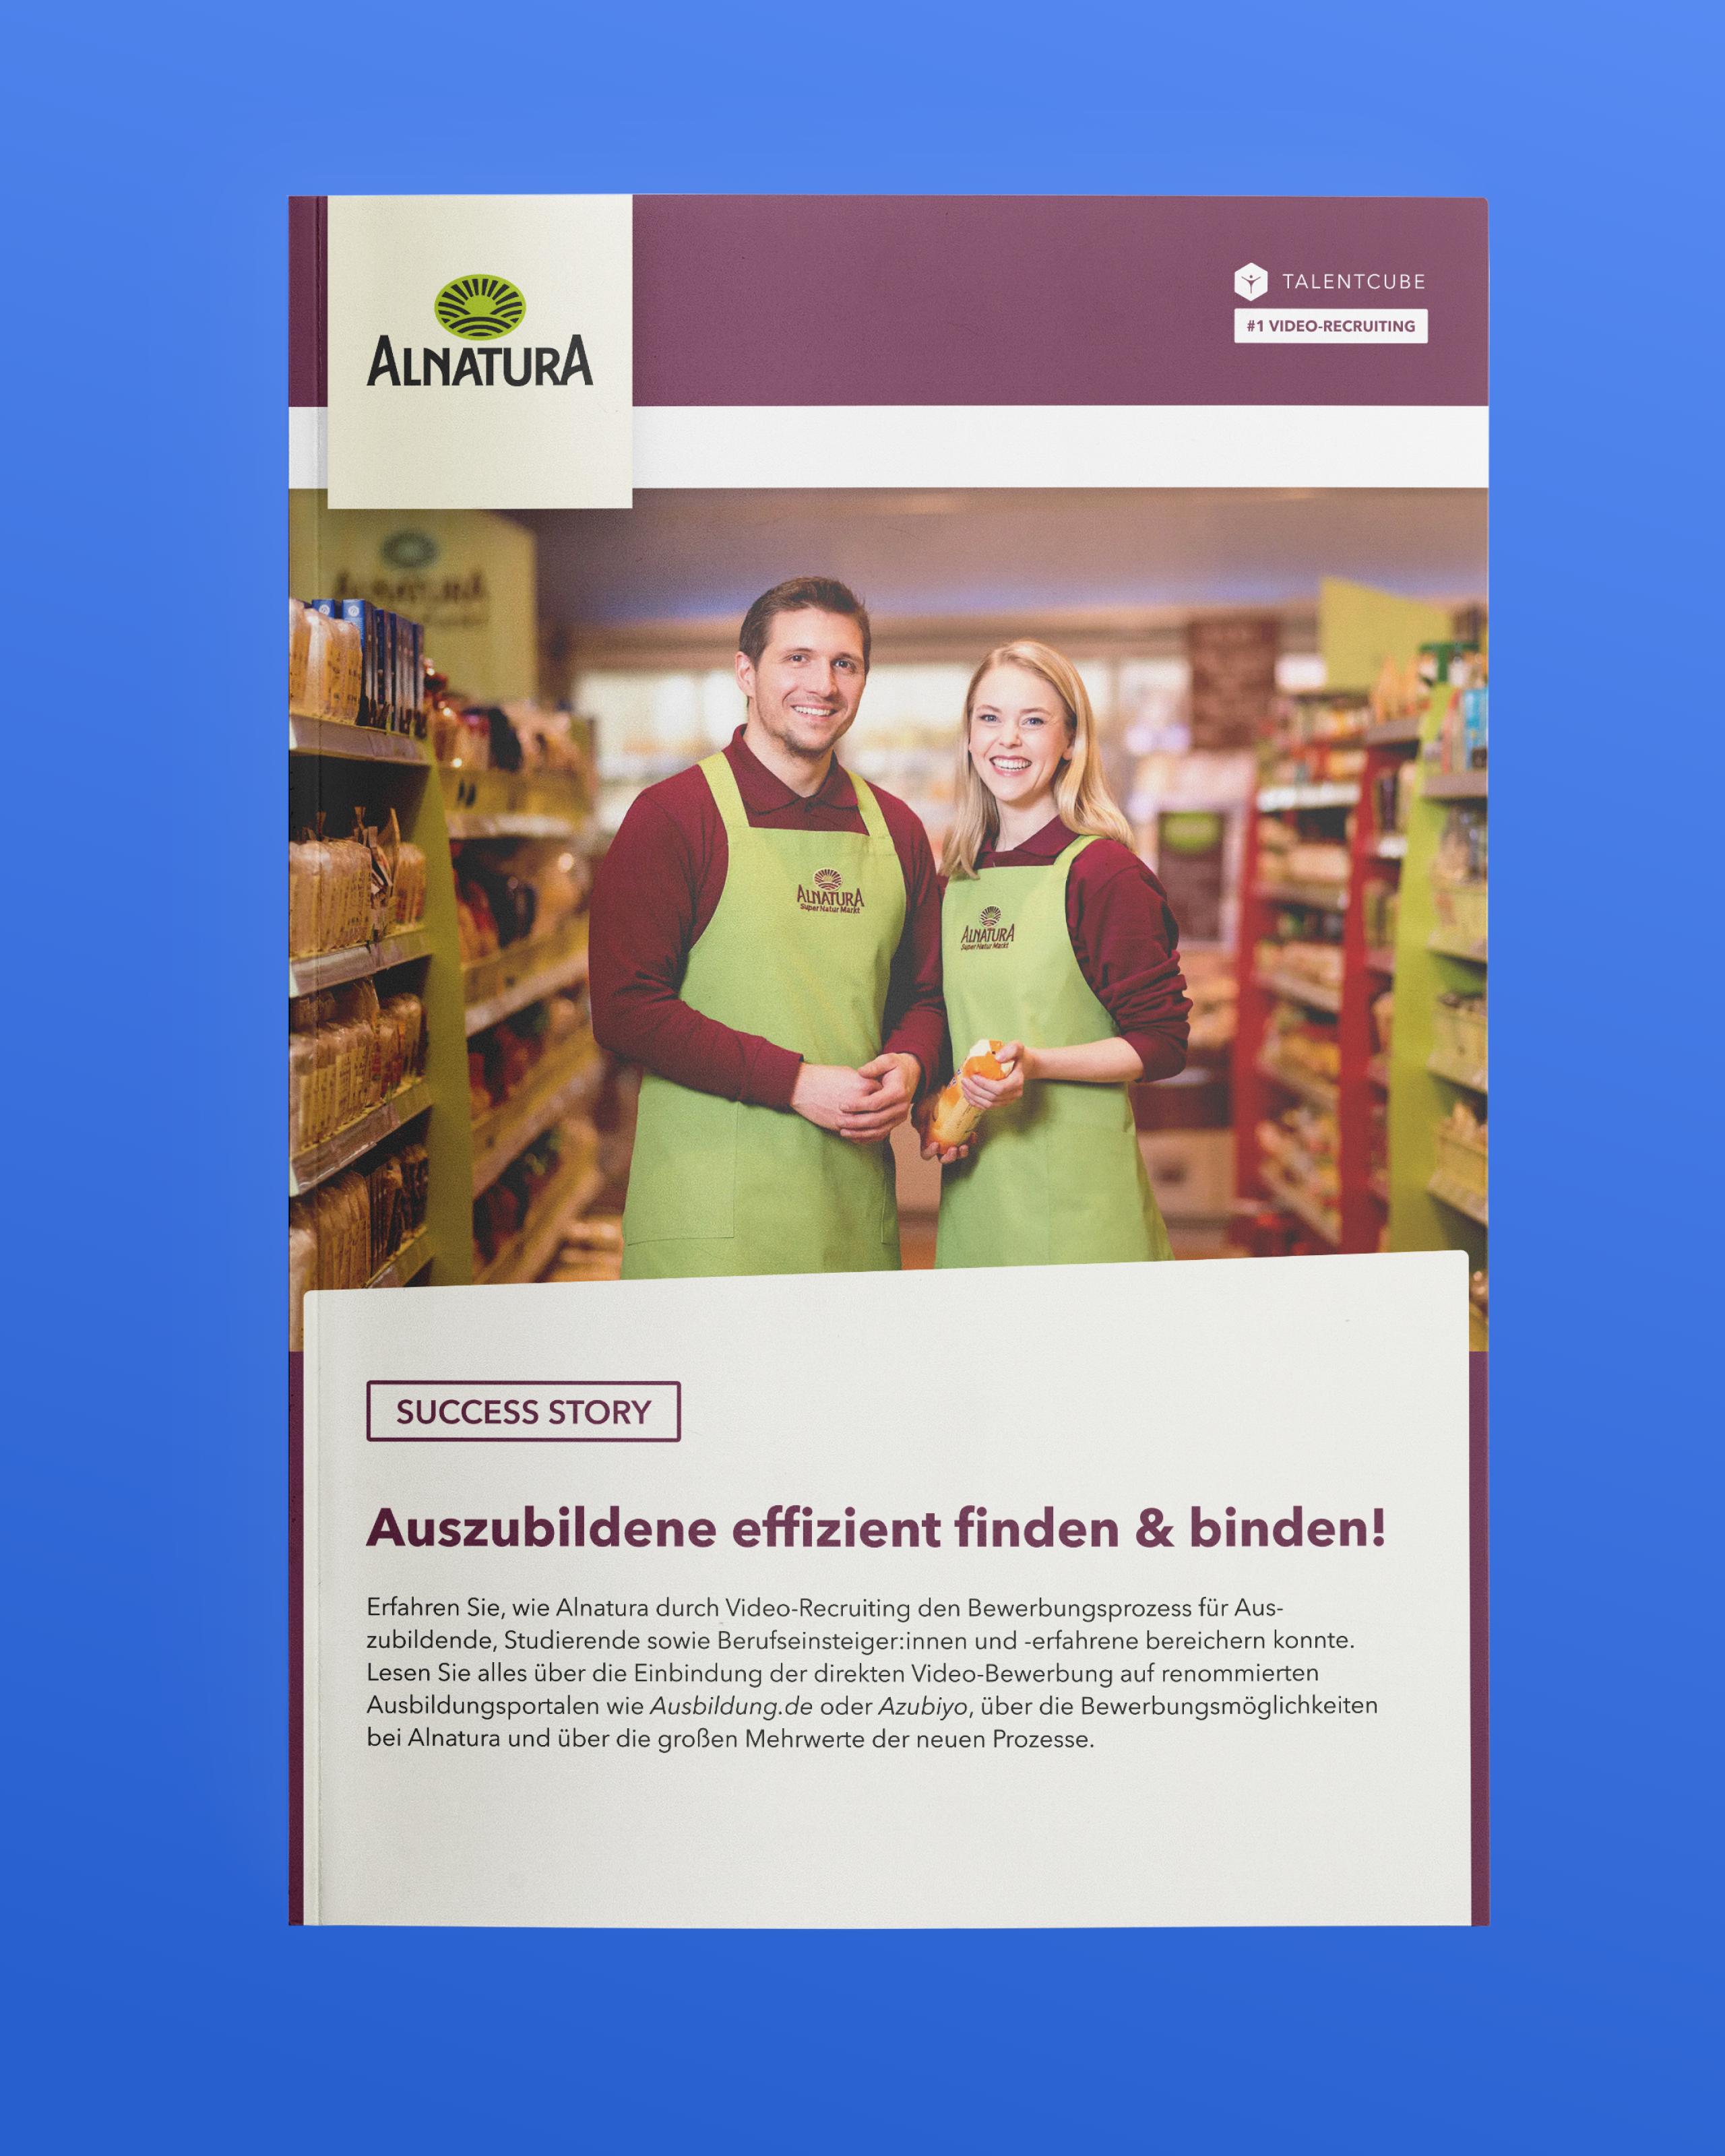 Alnatura –Auszubildene effizient finden & binden!